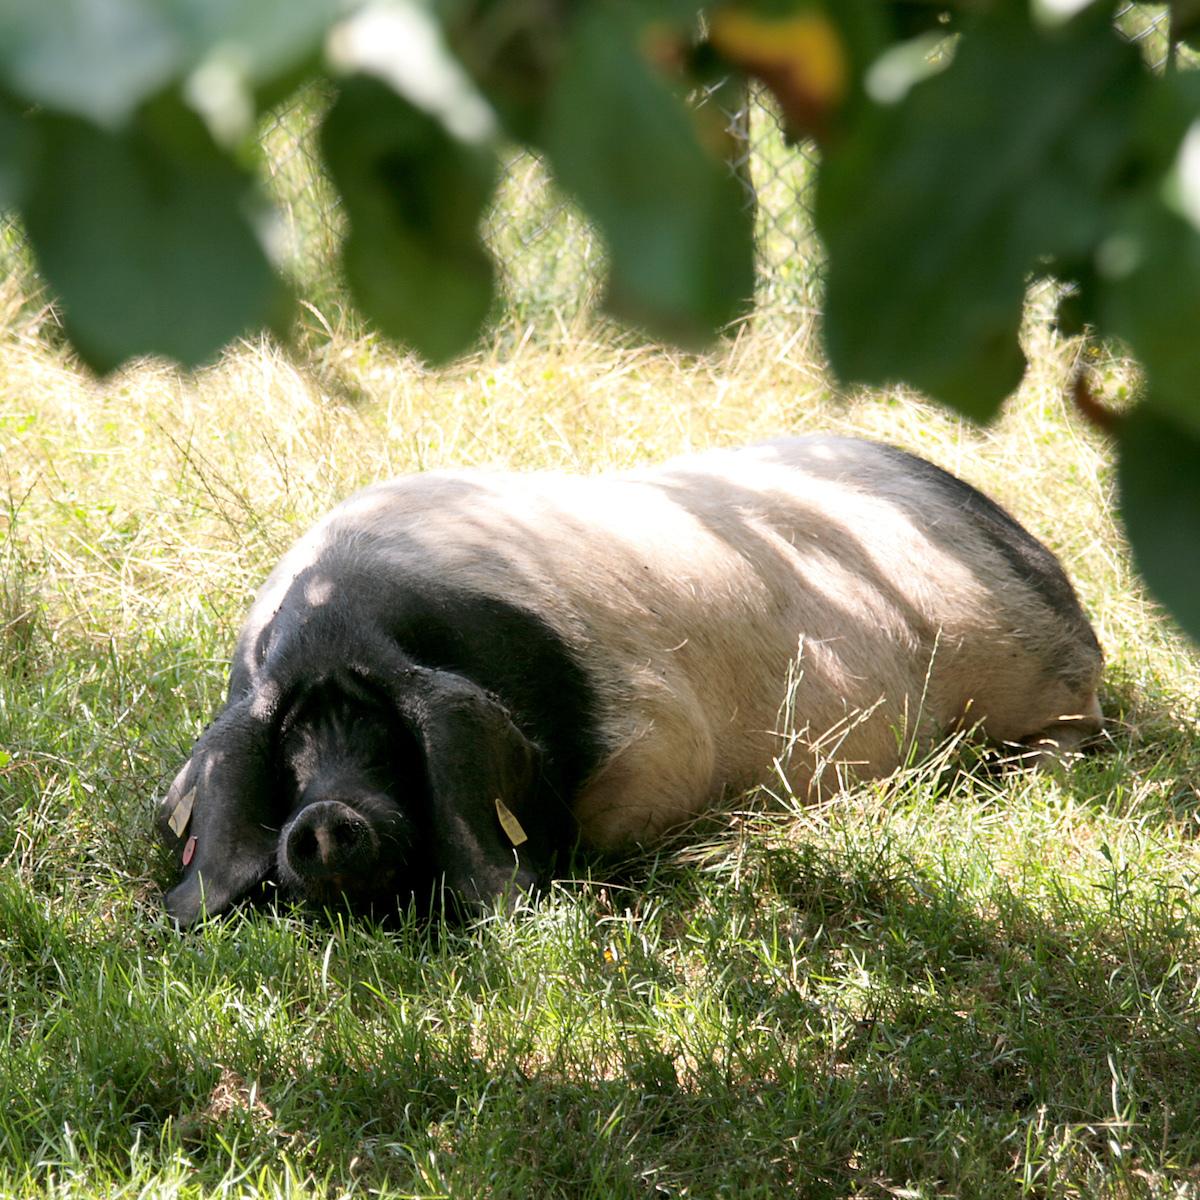 Porc basque©Philippe Derynck